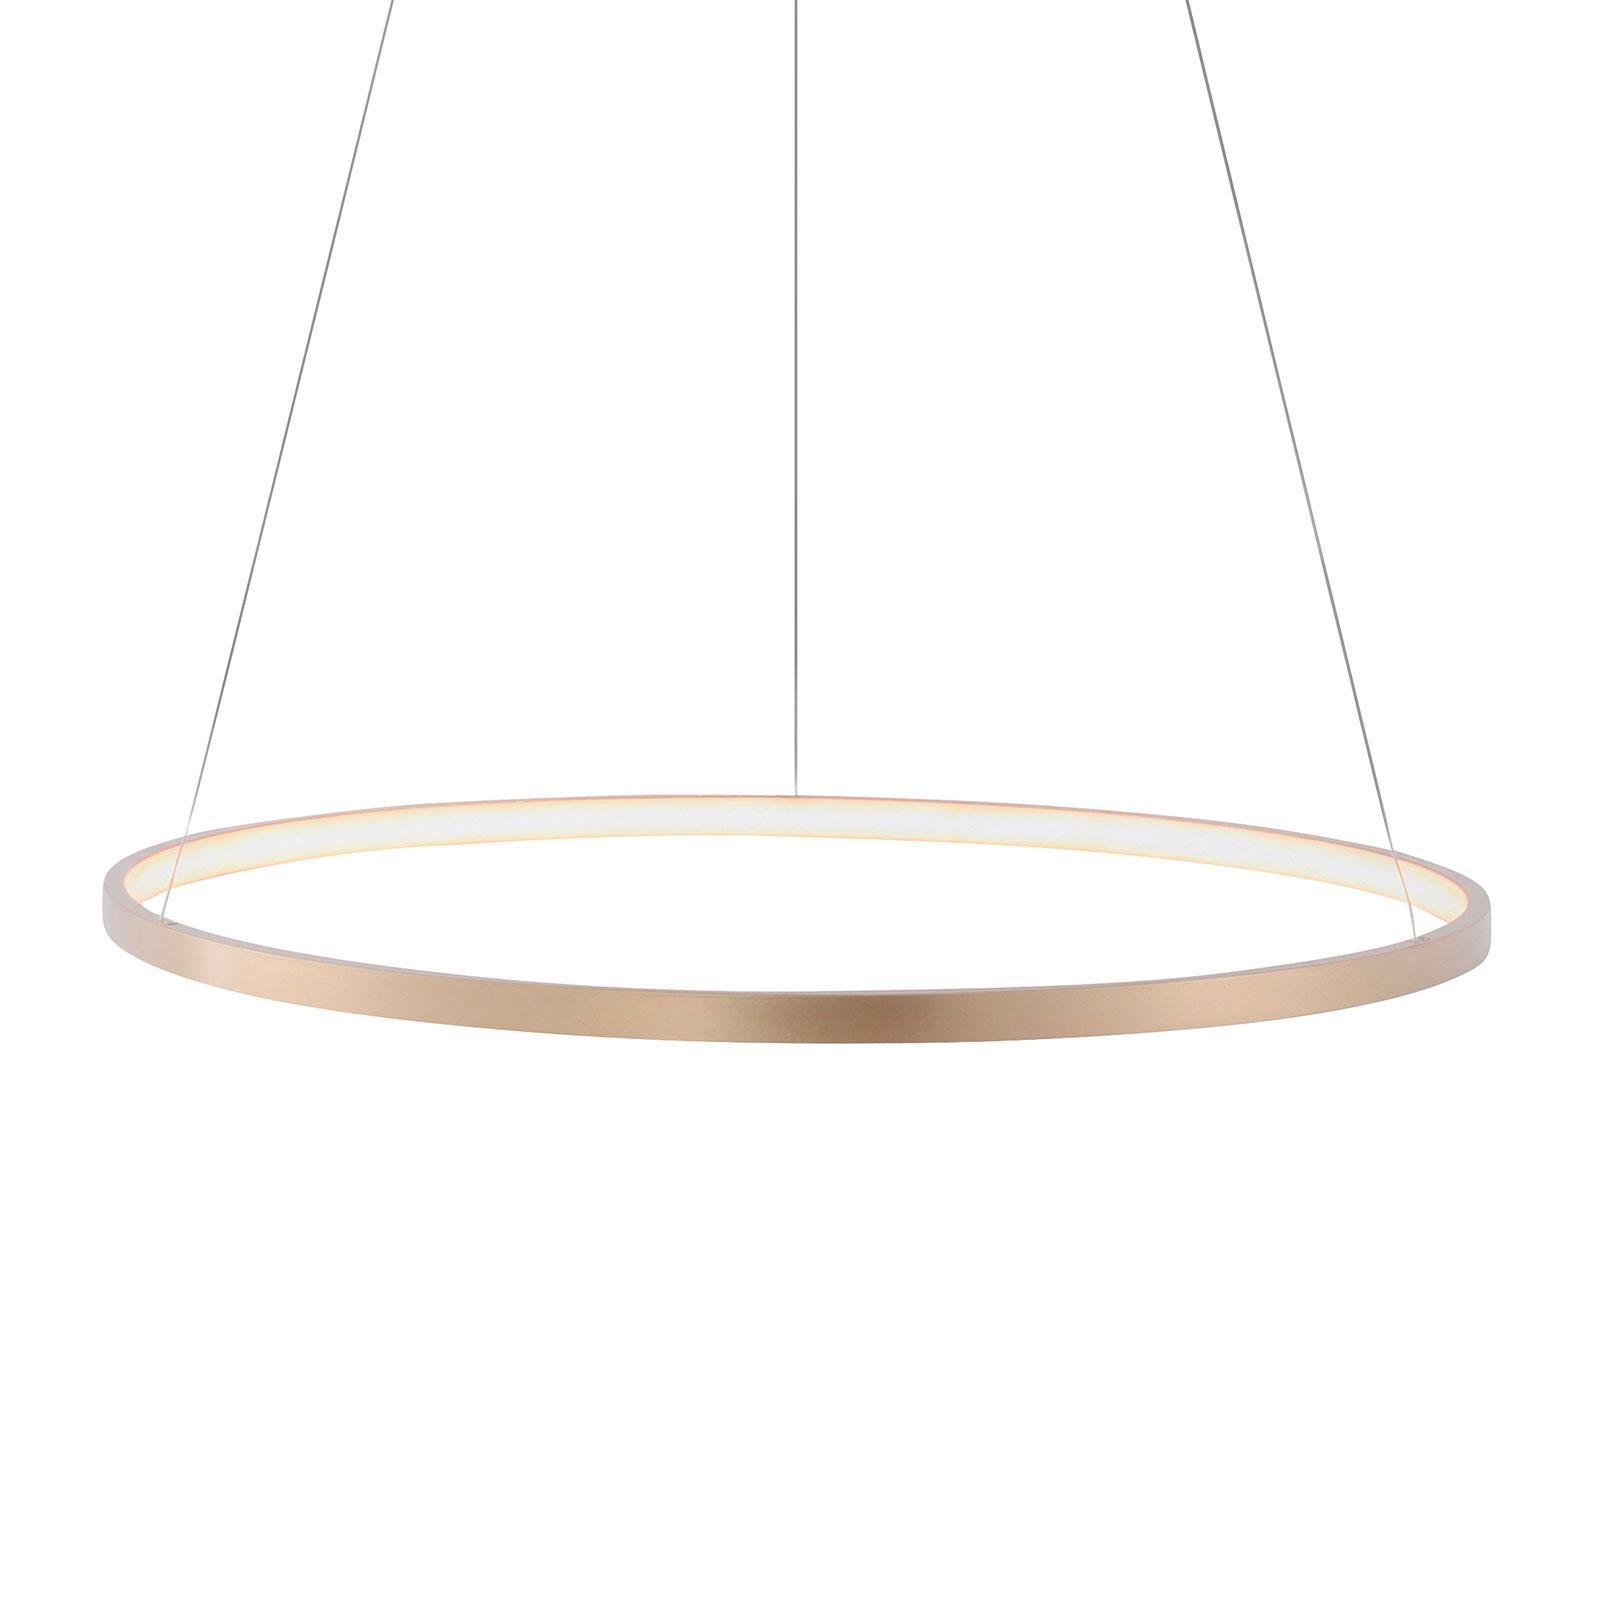 LED-pendellampe Circle gull, Ø 60 cm